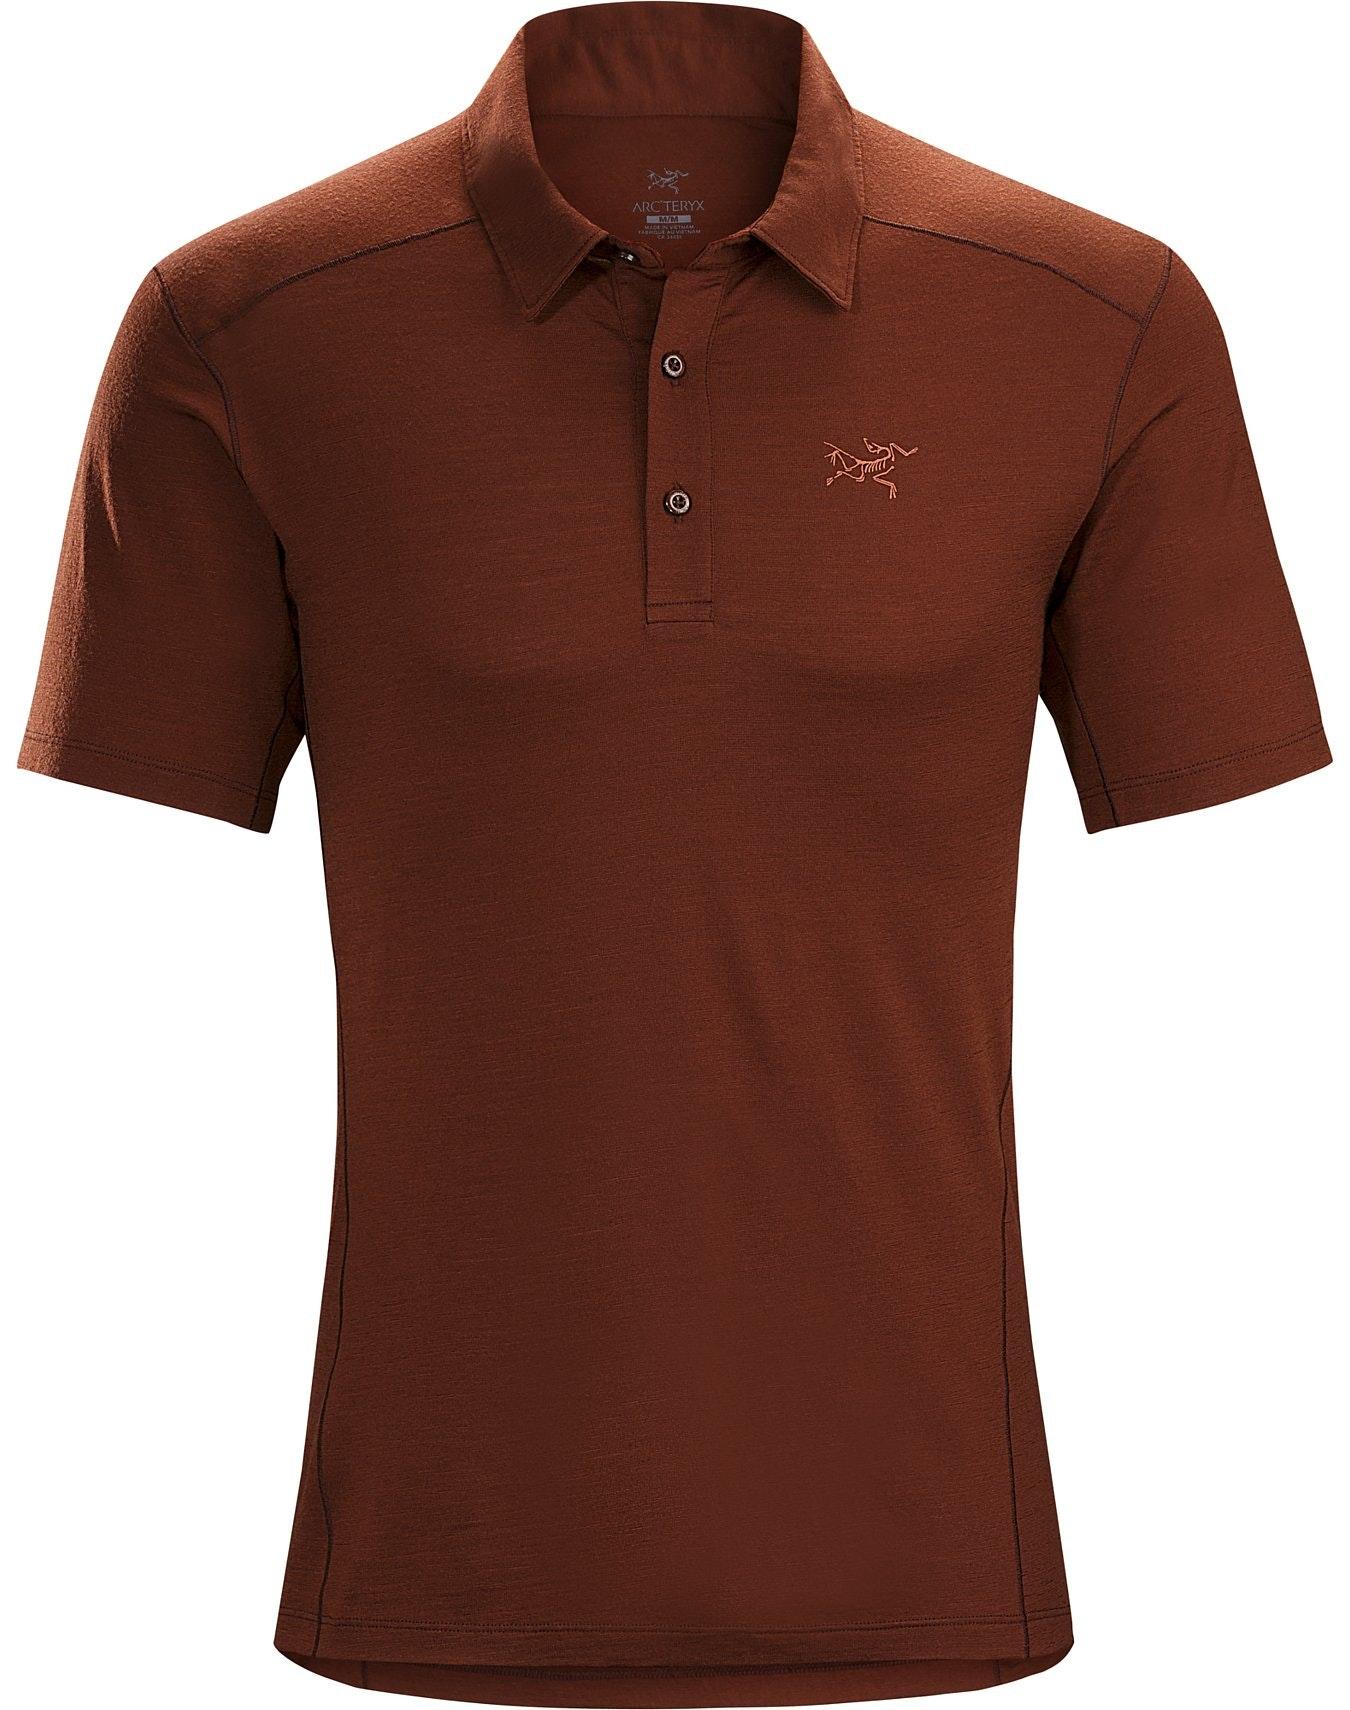 Pelion Polo Shirt Mens Arcteryx